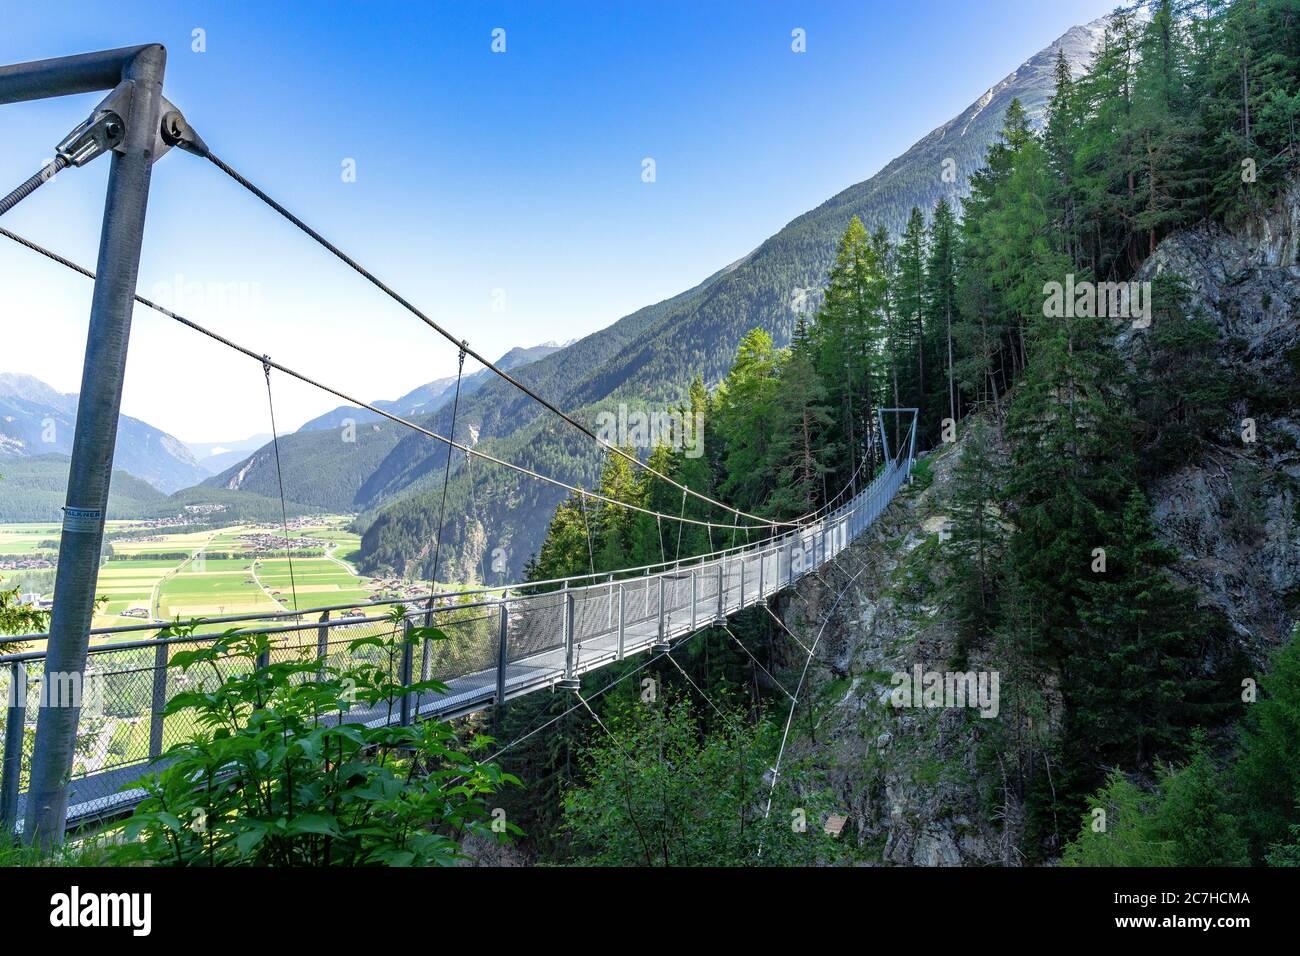 Europe, Austria, Tyrol, Ötztal Alps, Ötztal, Längenfeld suspension ...